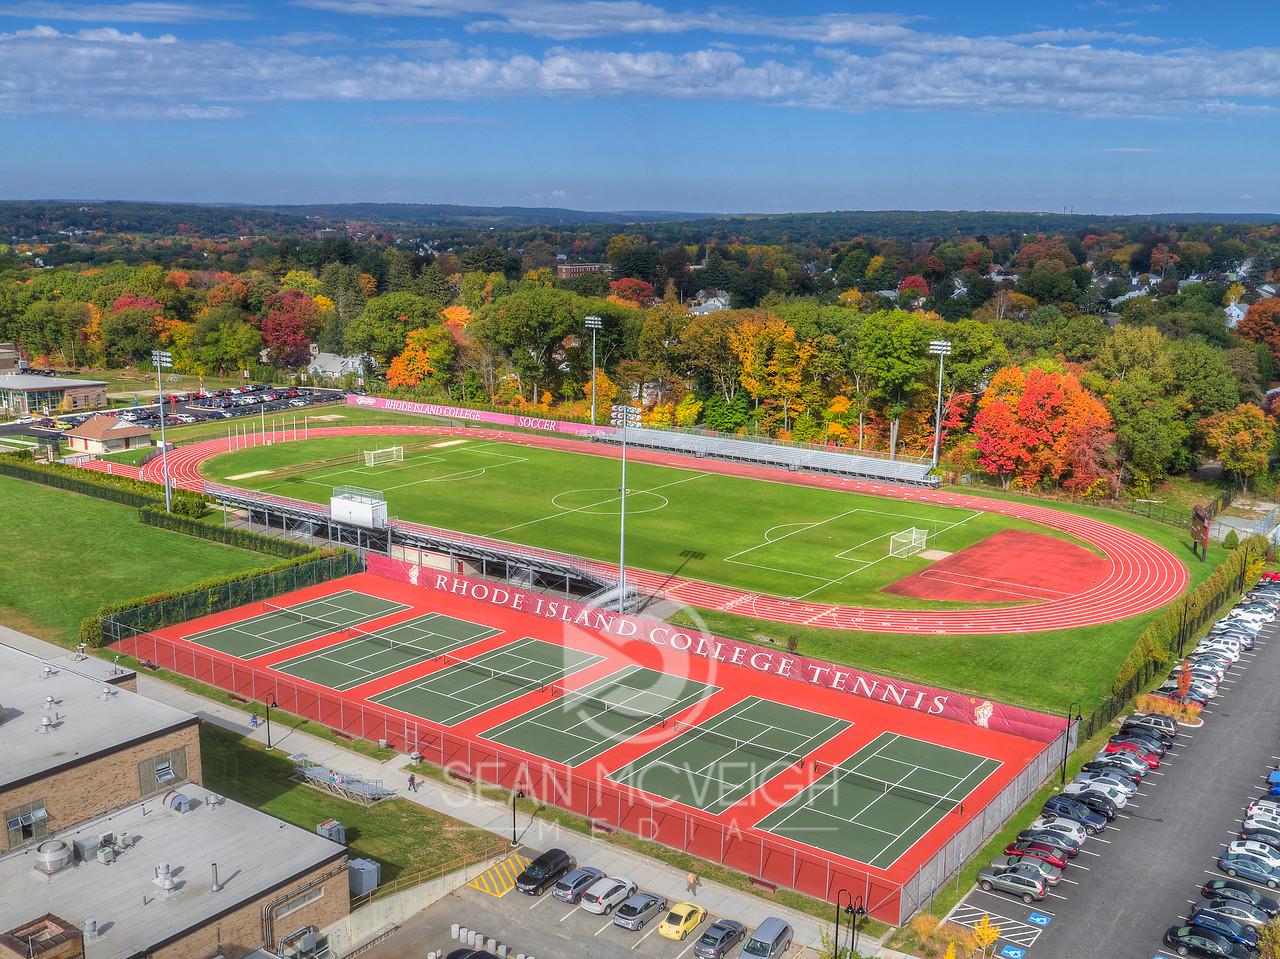 Drone Aerial of Rhode Island College by Sean McVeigh Media